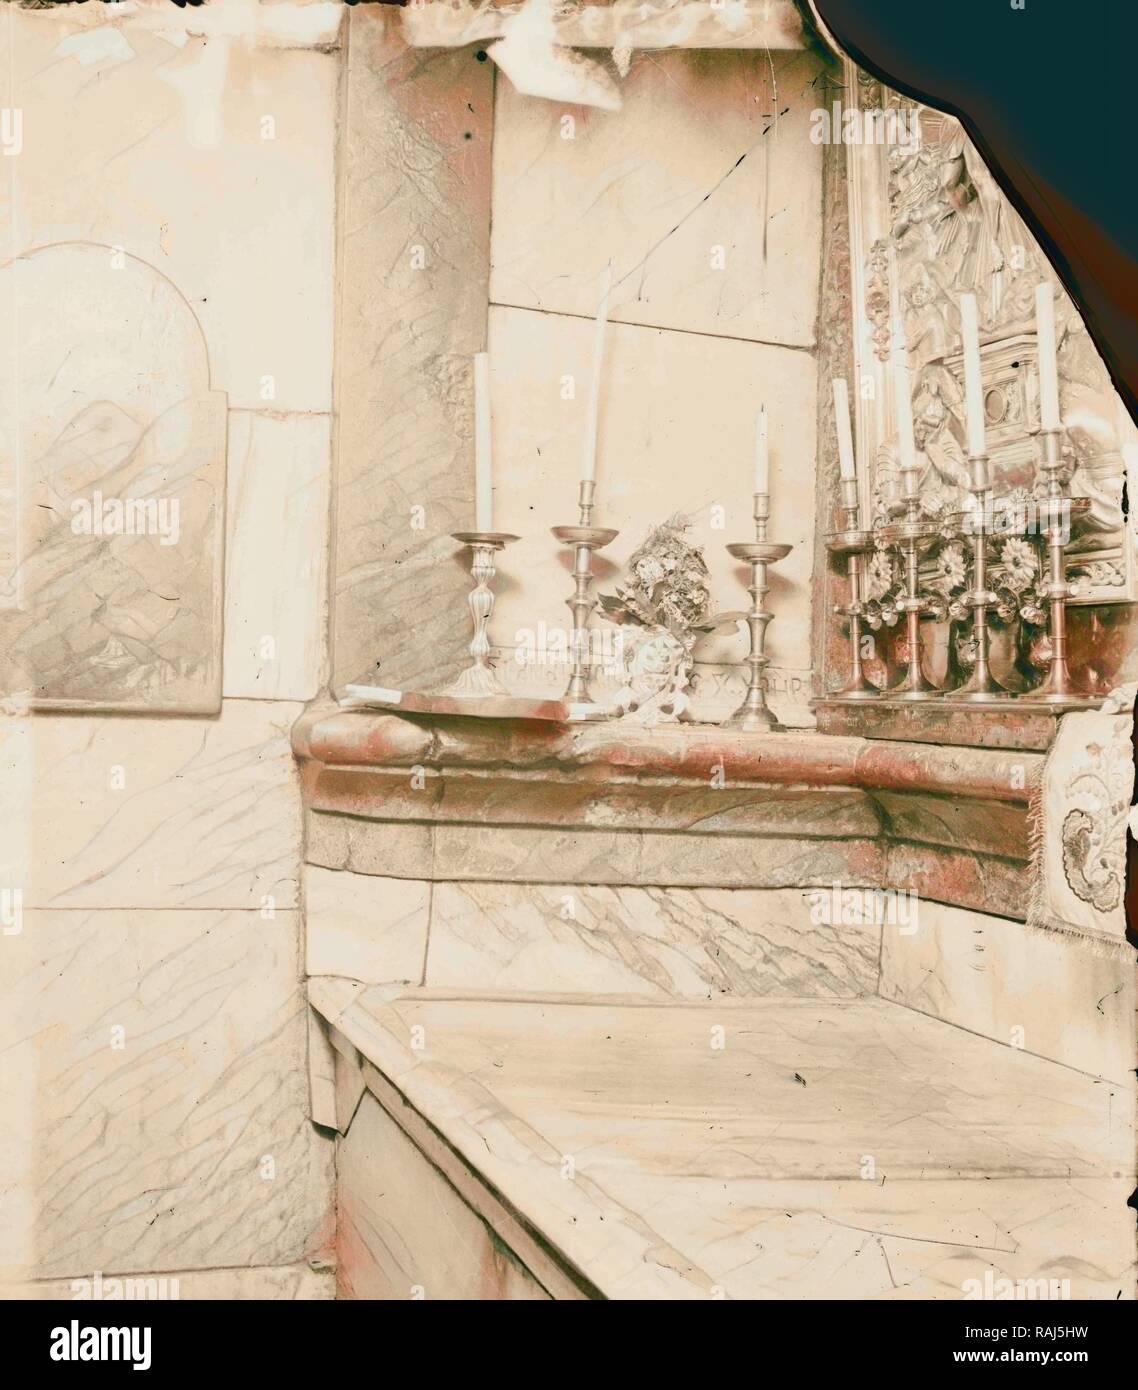 Via Dolorosa, beginning at St. Stephen's Gate The tomb, Fourteenth Station of the Cross 1900, Jerusalem, Israel reimagined - Stock Image